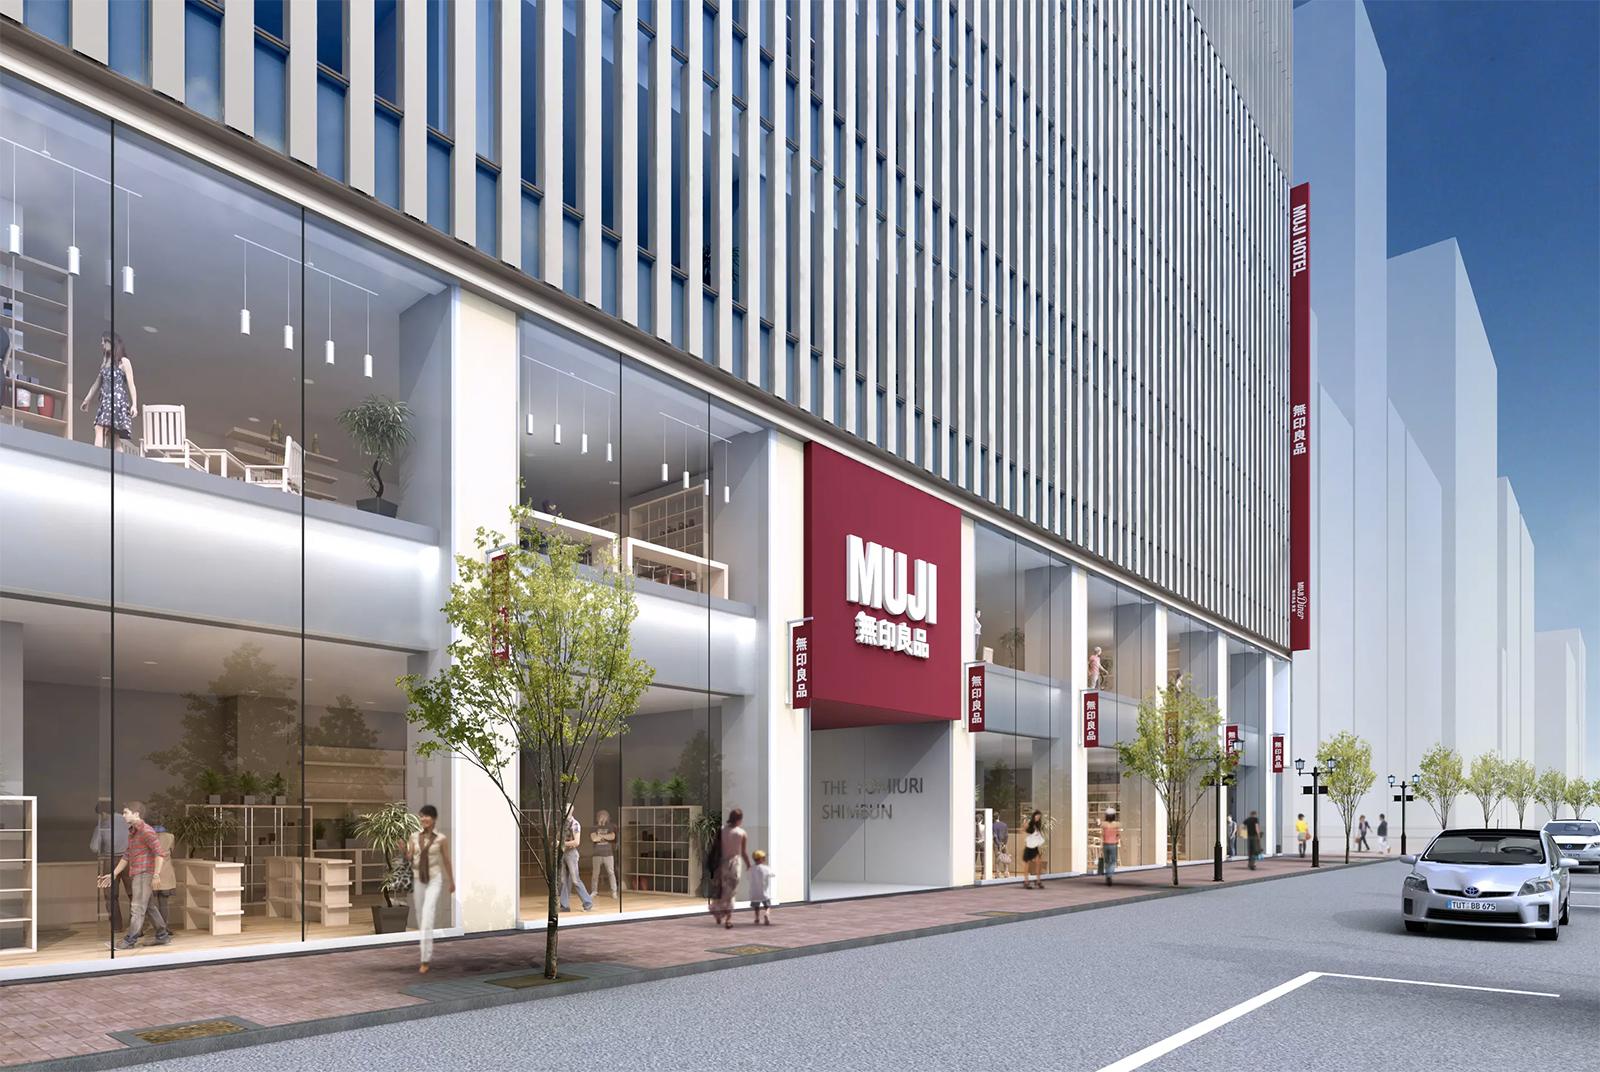 Muji Hotel Tokyo -- opening in 2019